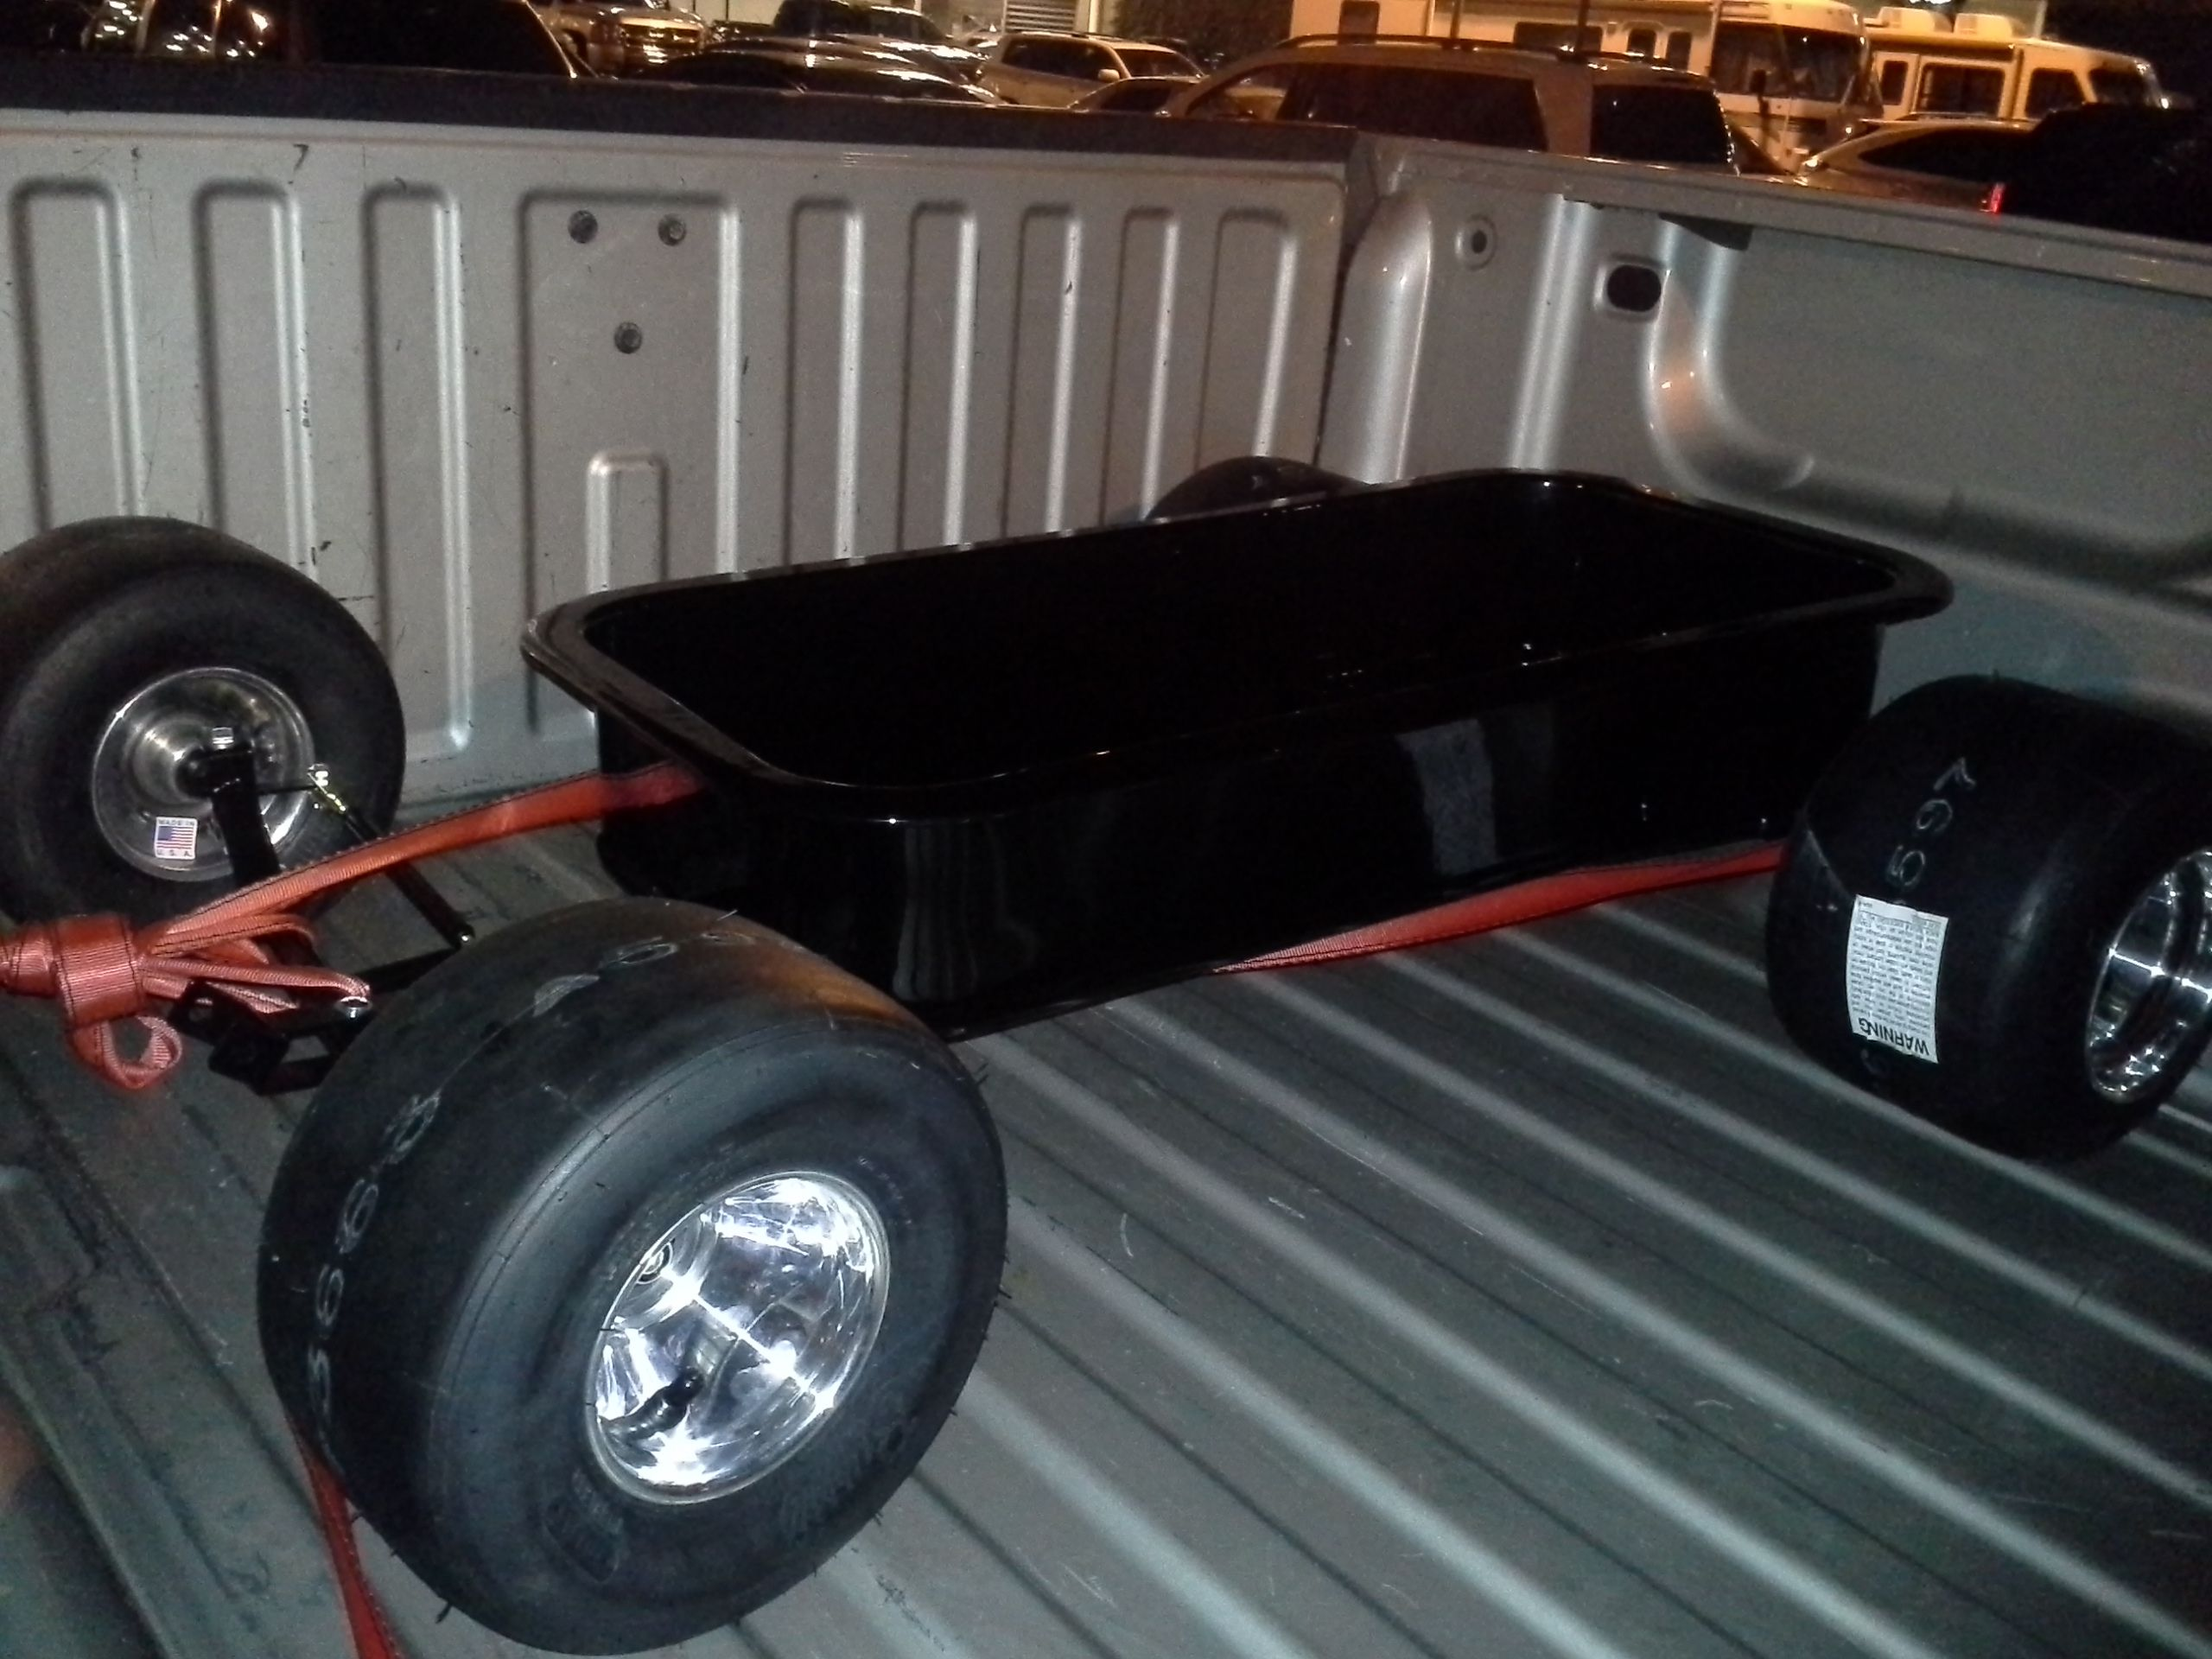 Black LowRider Wagon by Baja Wagon Custom wagons